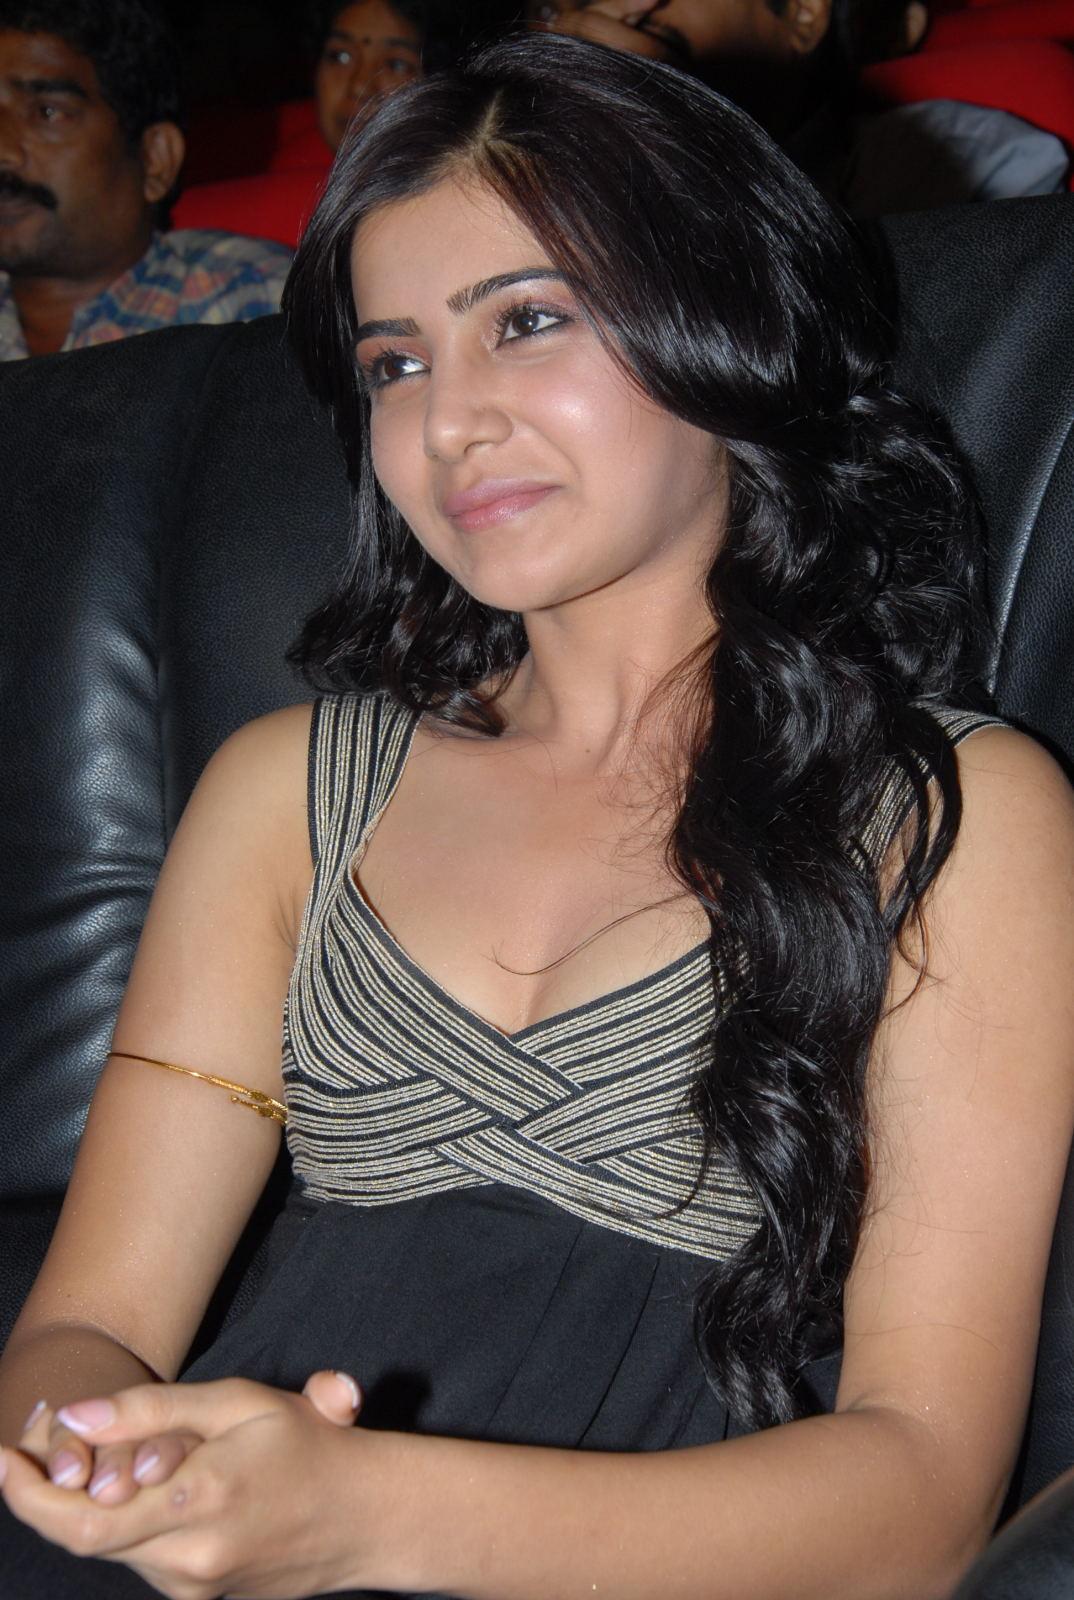 Cute samantha in black